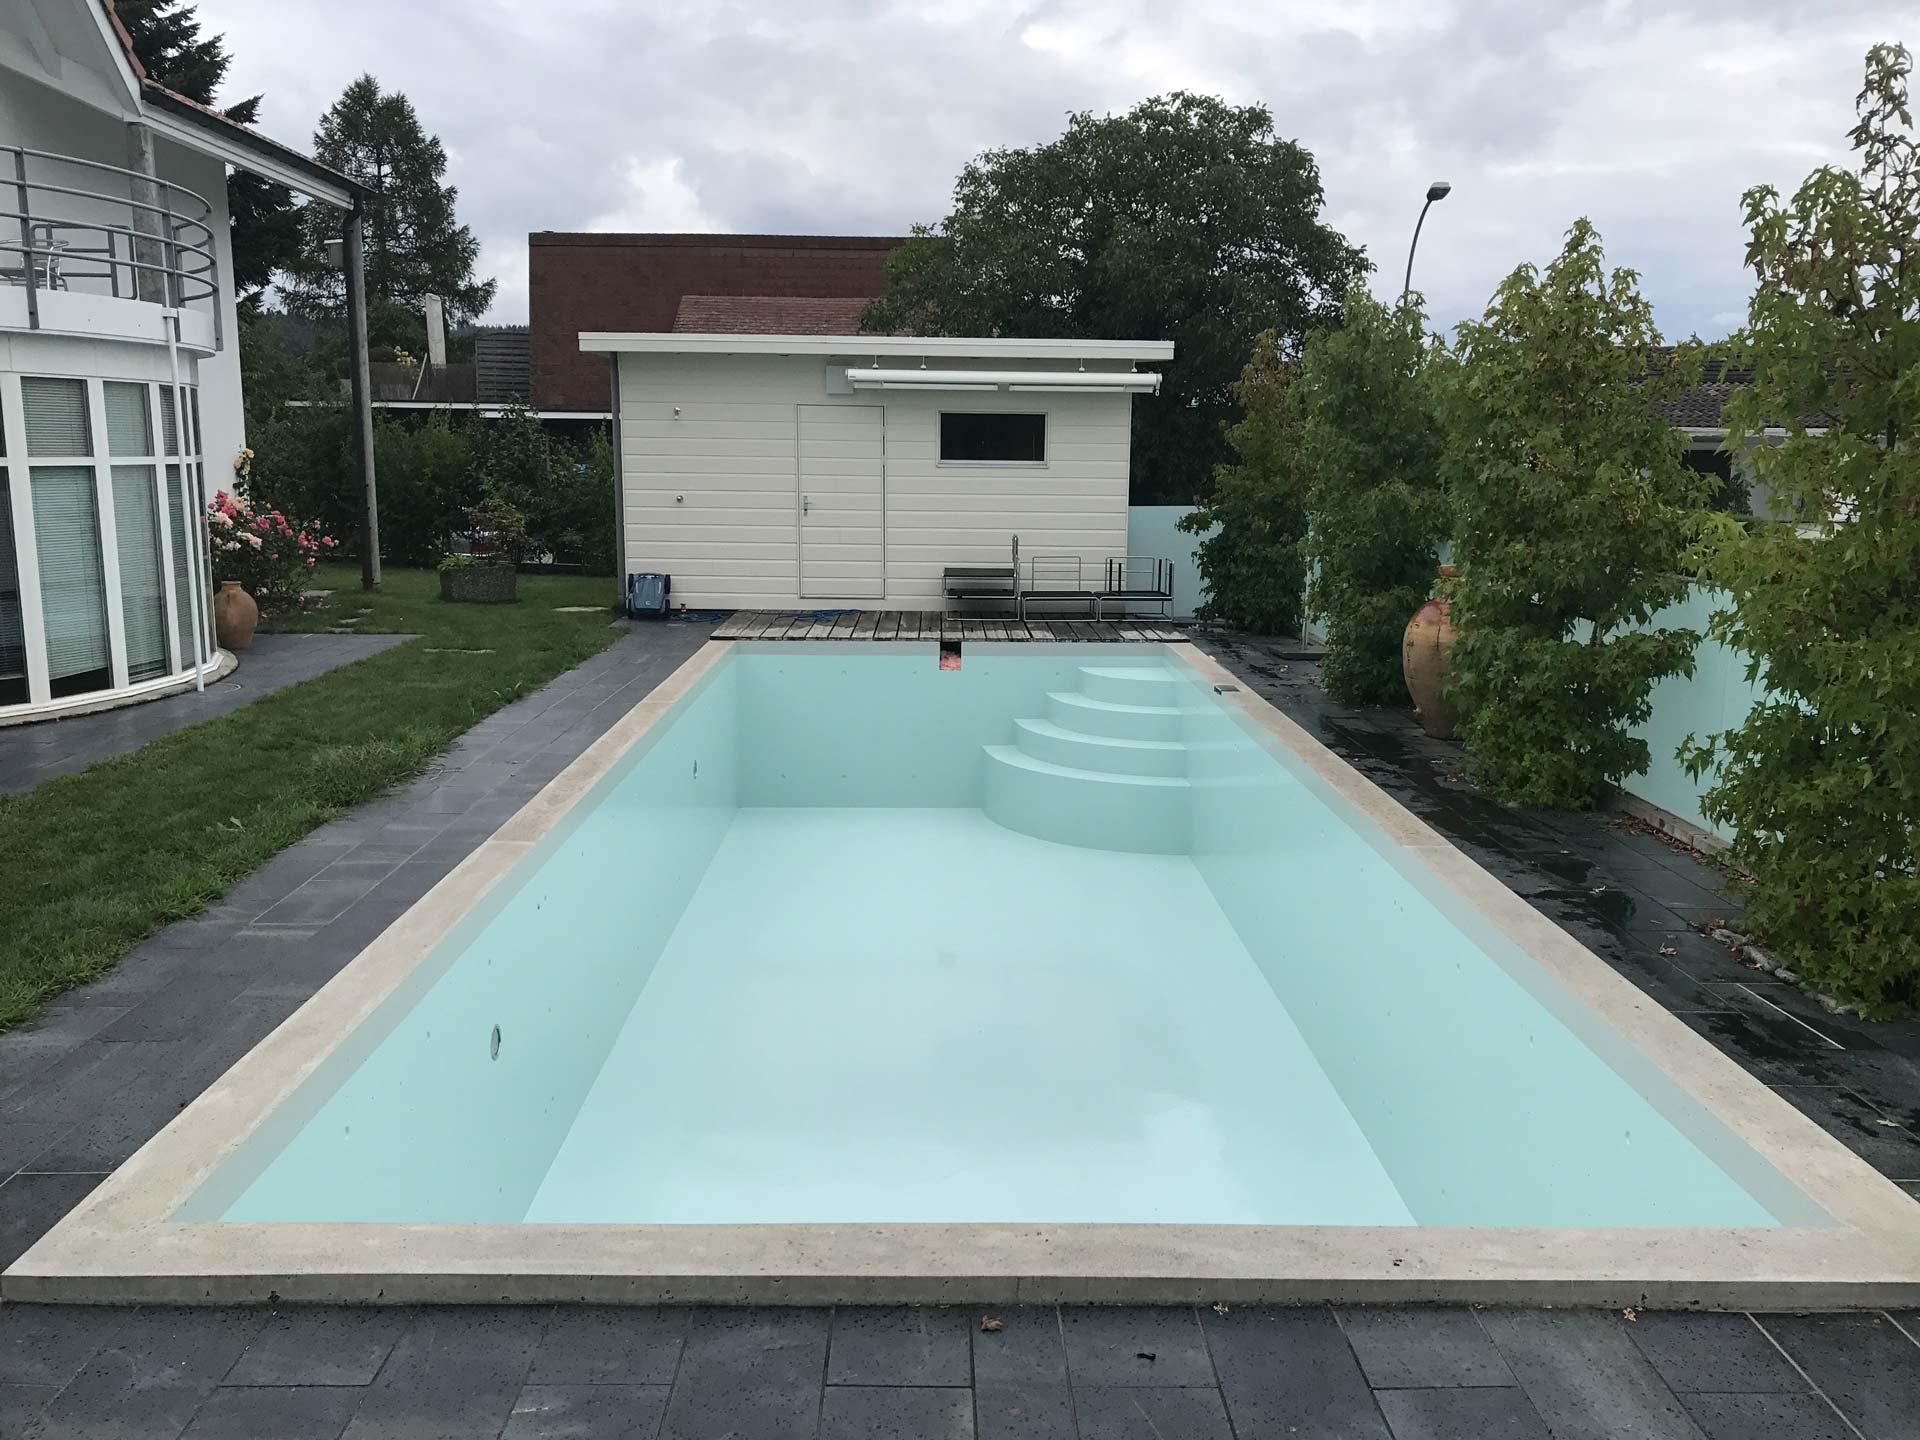 Poolbeschichtung | Ins | Wagner Maler GmbH